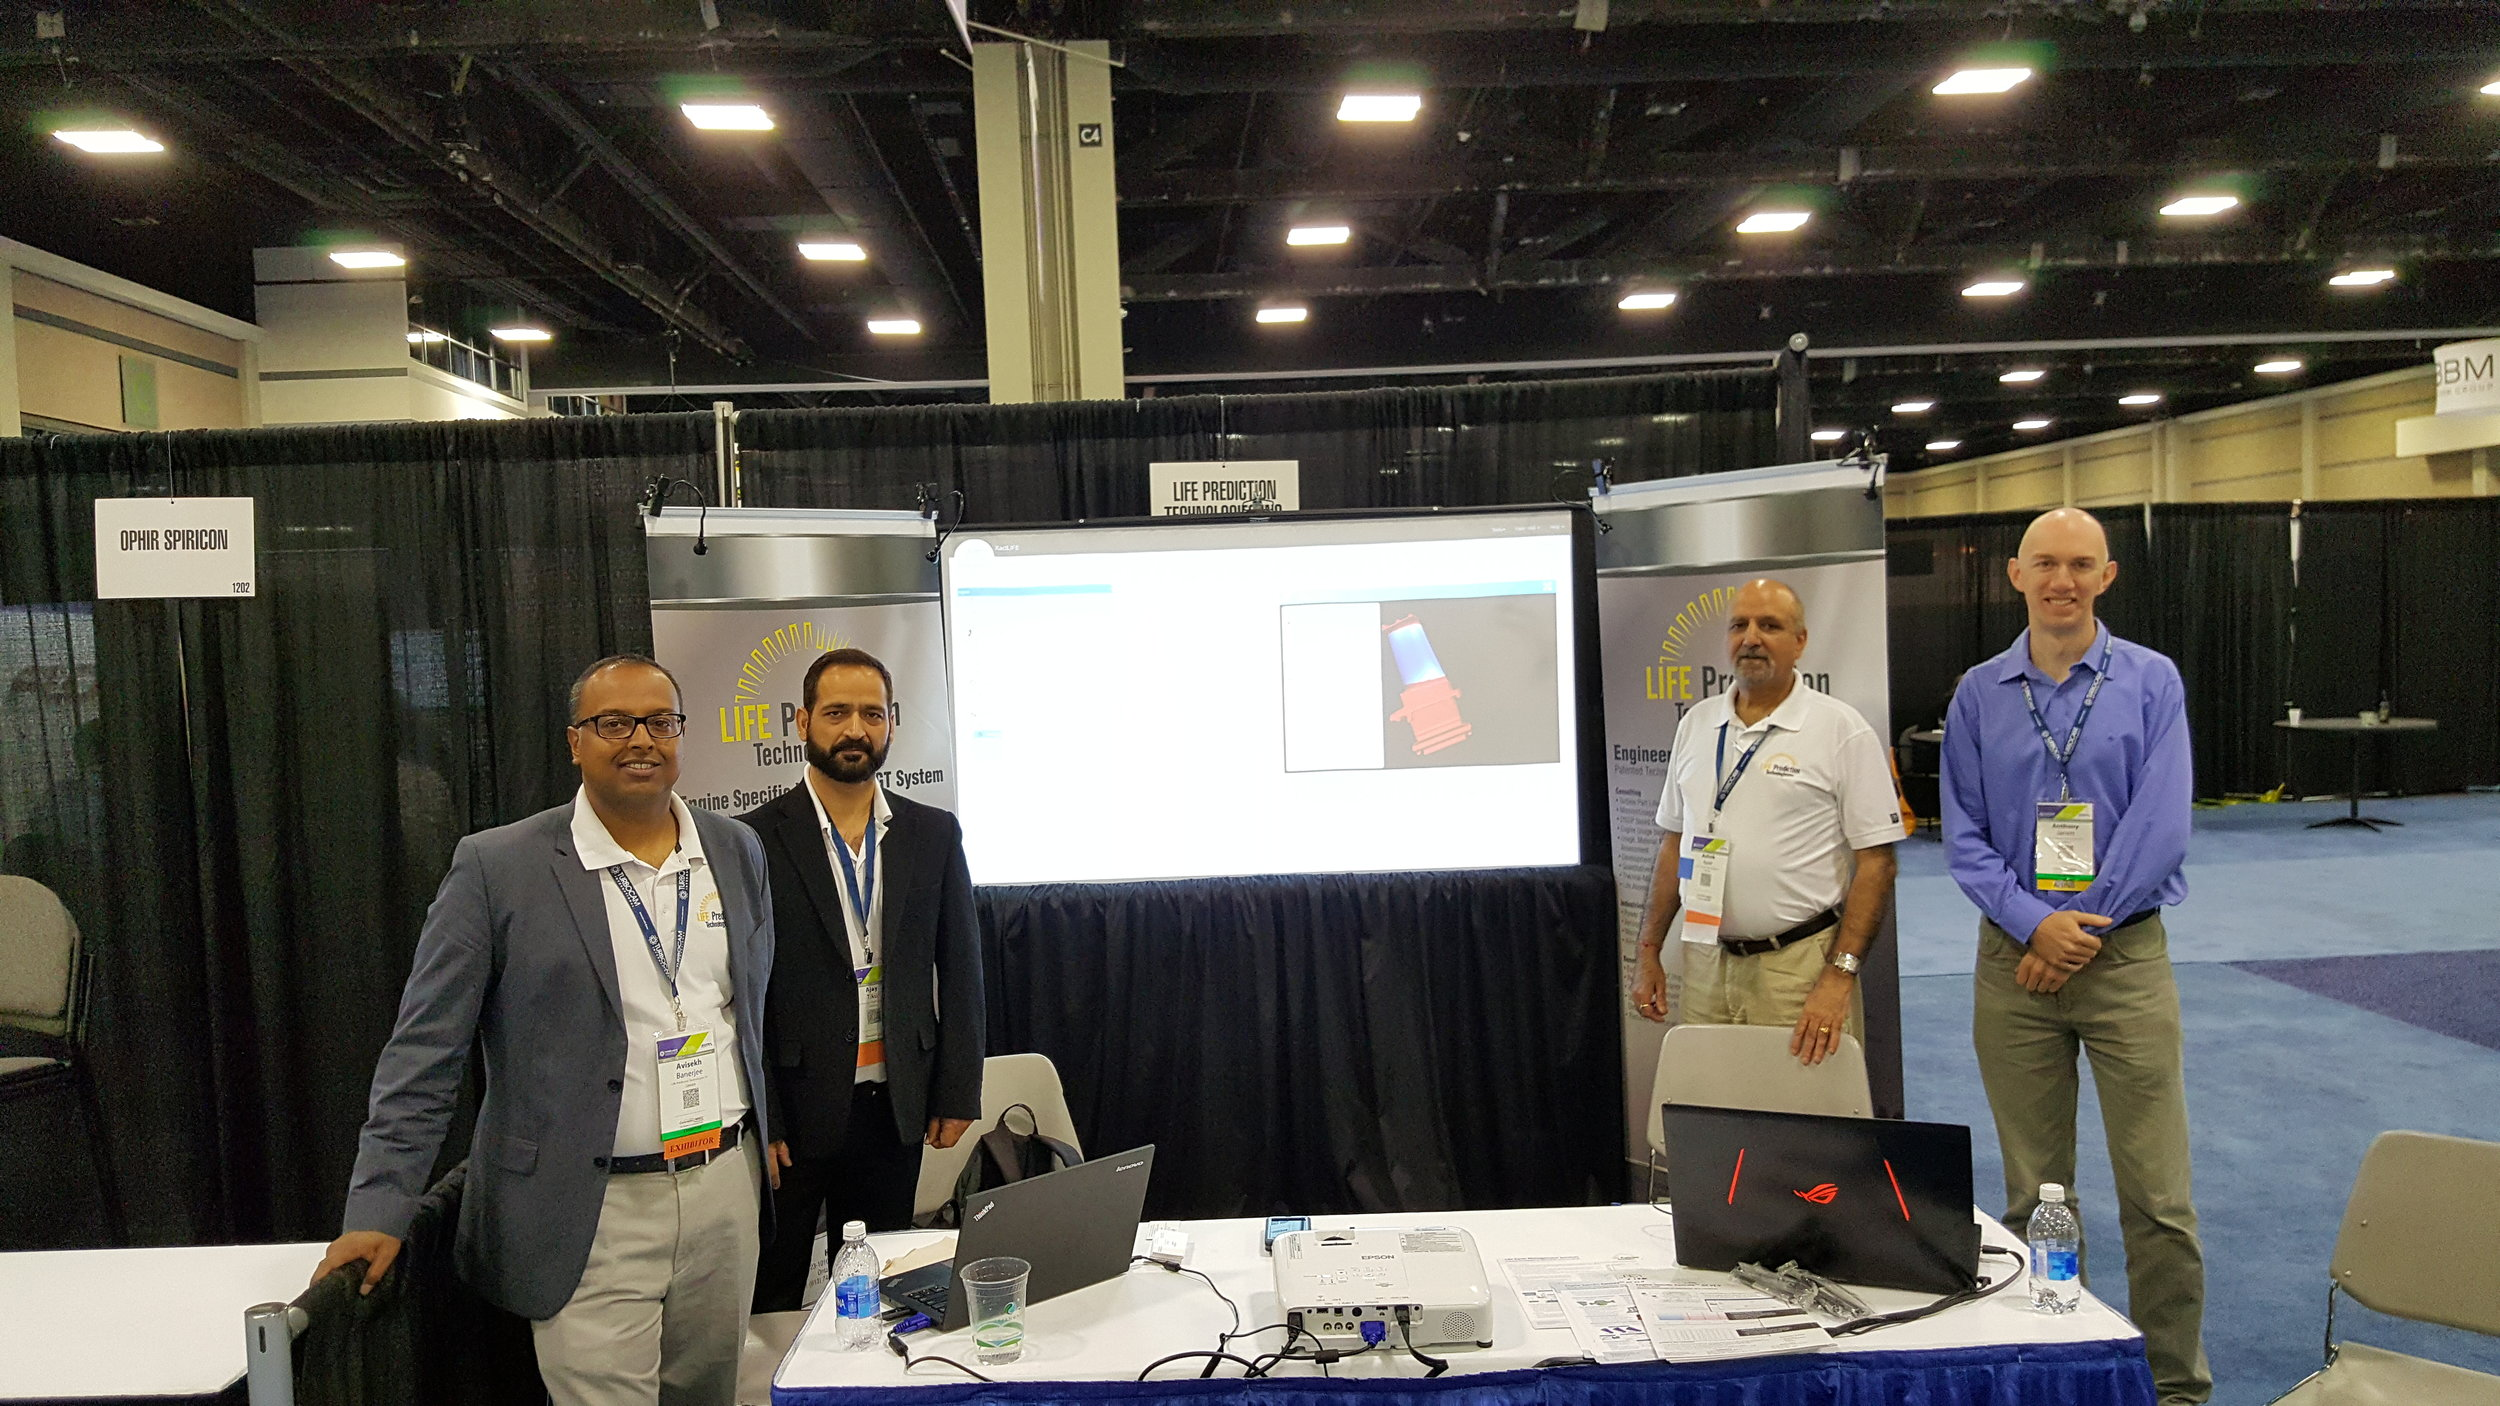 Avi Banerjee, Ajay Tiku, Ashok Koul and Tony Jarrett (Left to Right) @ Turbo Expo 2017, Charlotte, NC